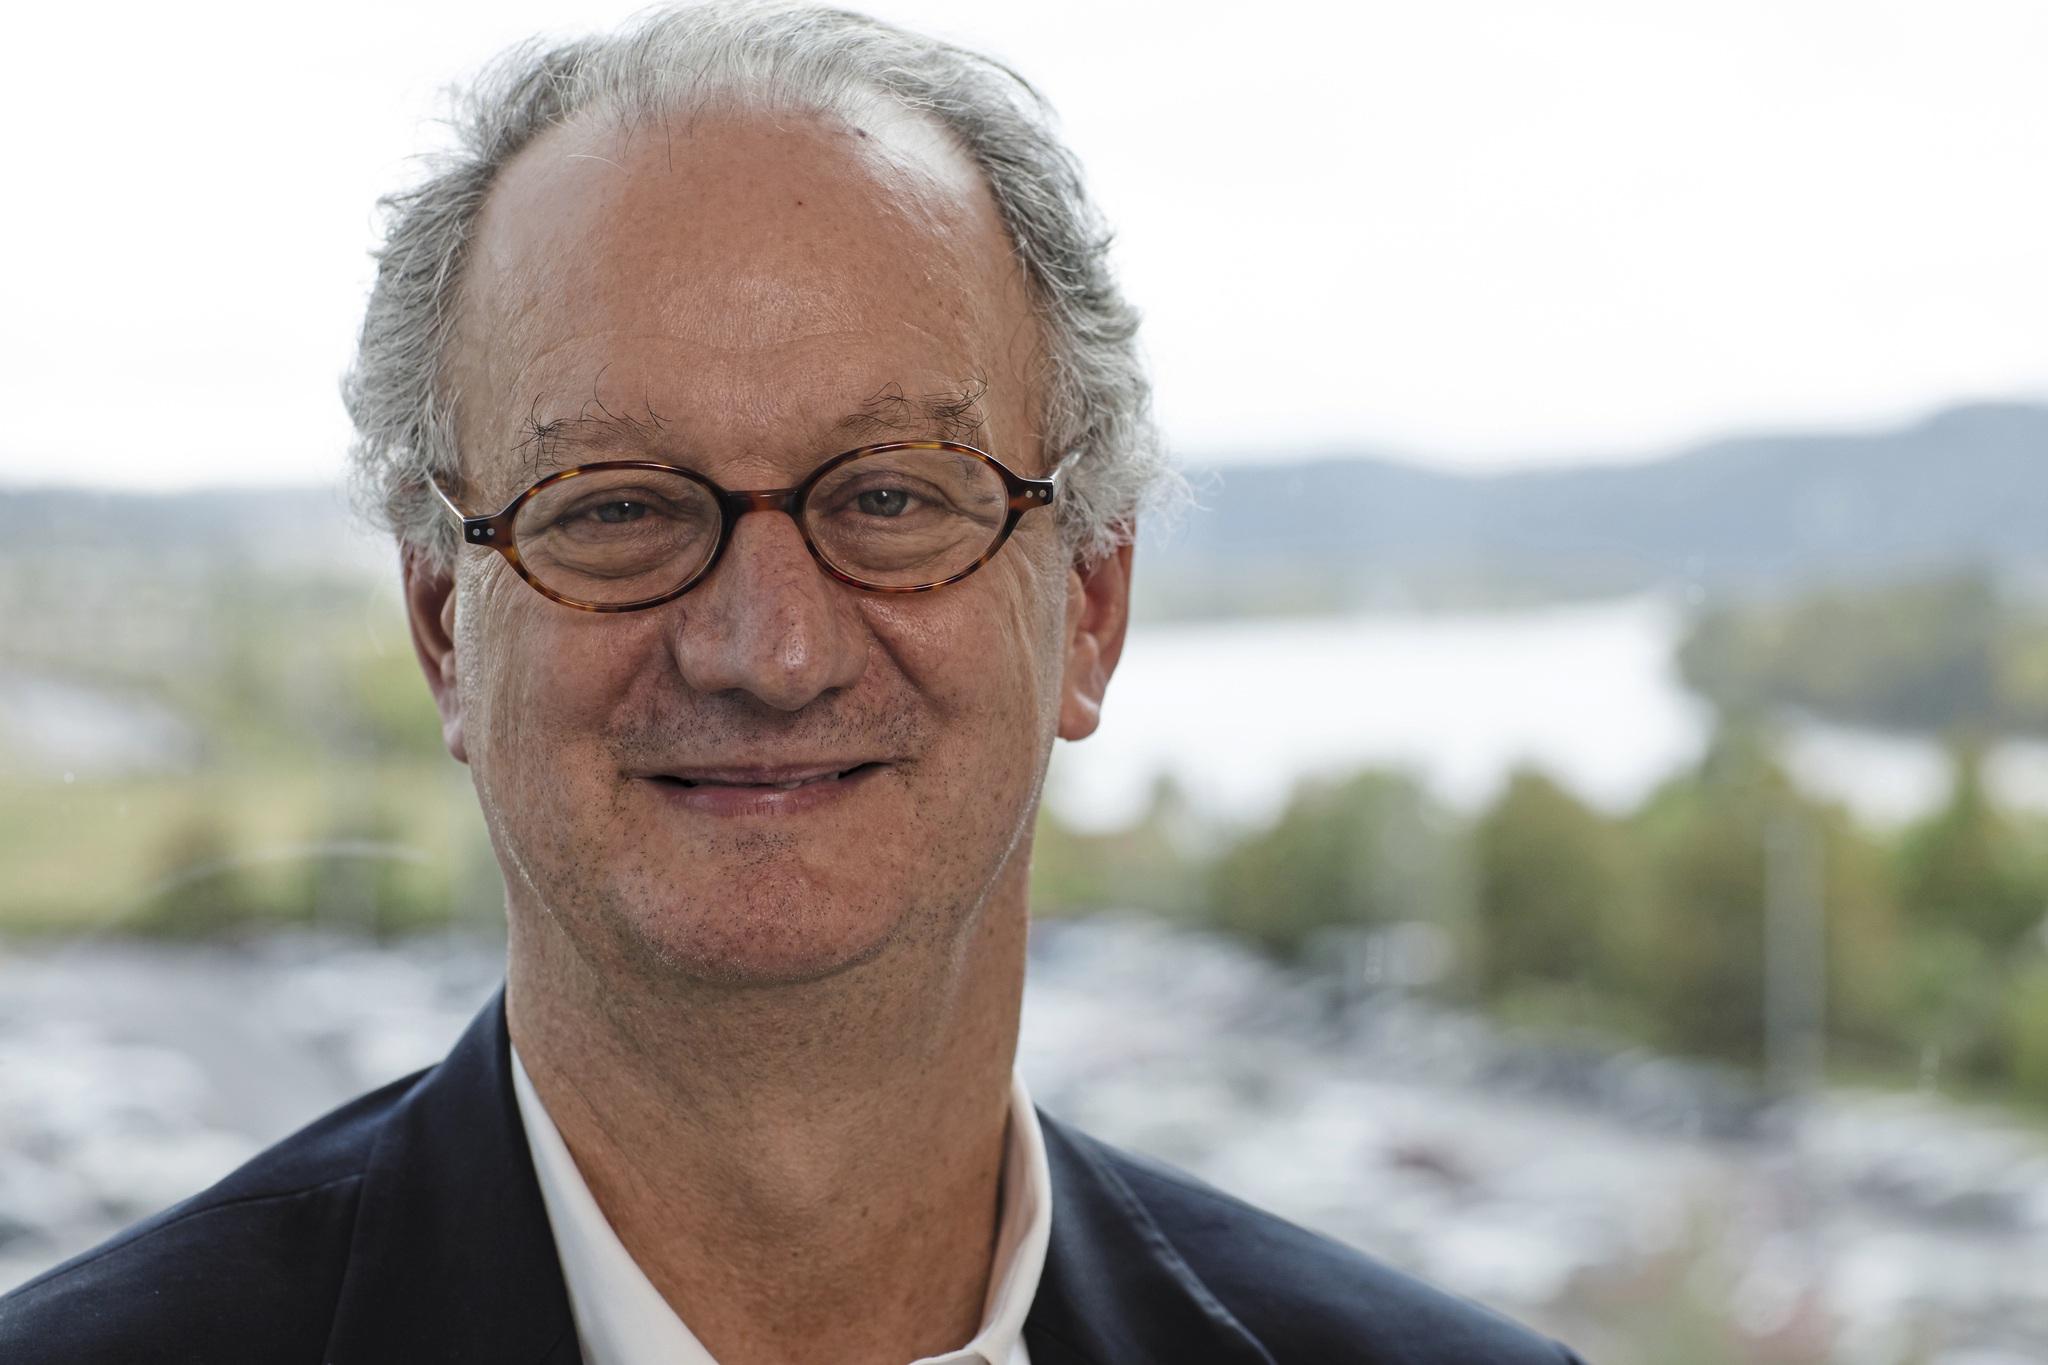 Toren Finkel Dr. Toren Finkel, director of the Aging Instittute of UPMC and the University of Pittsburgh